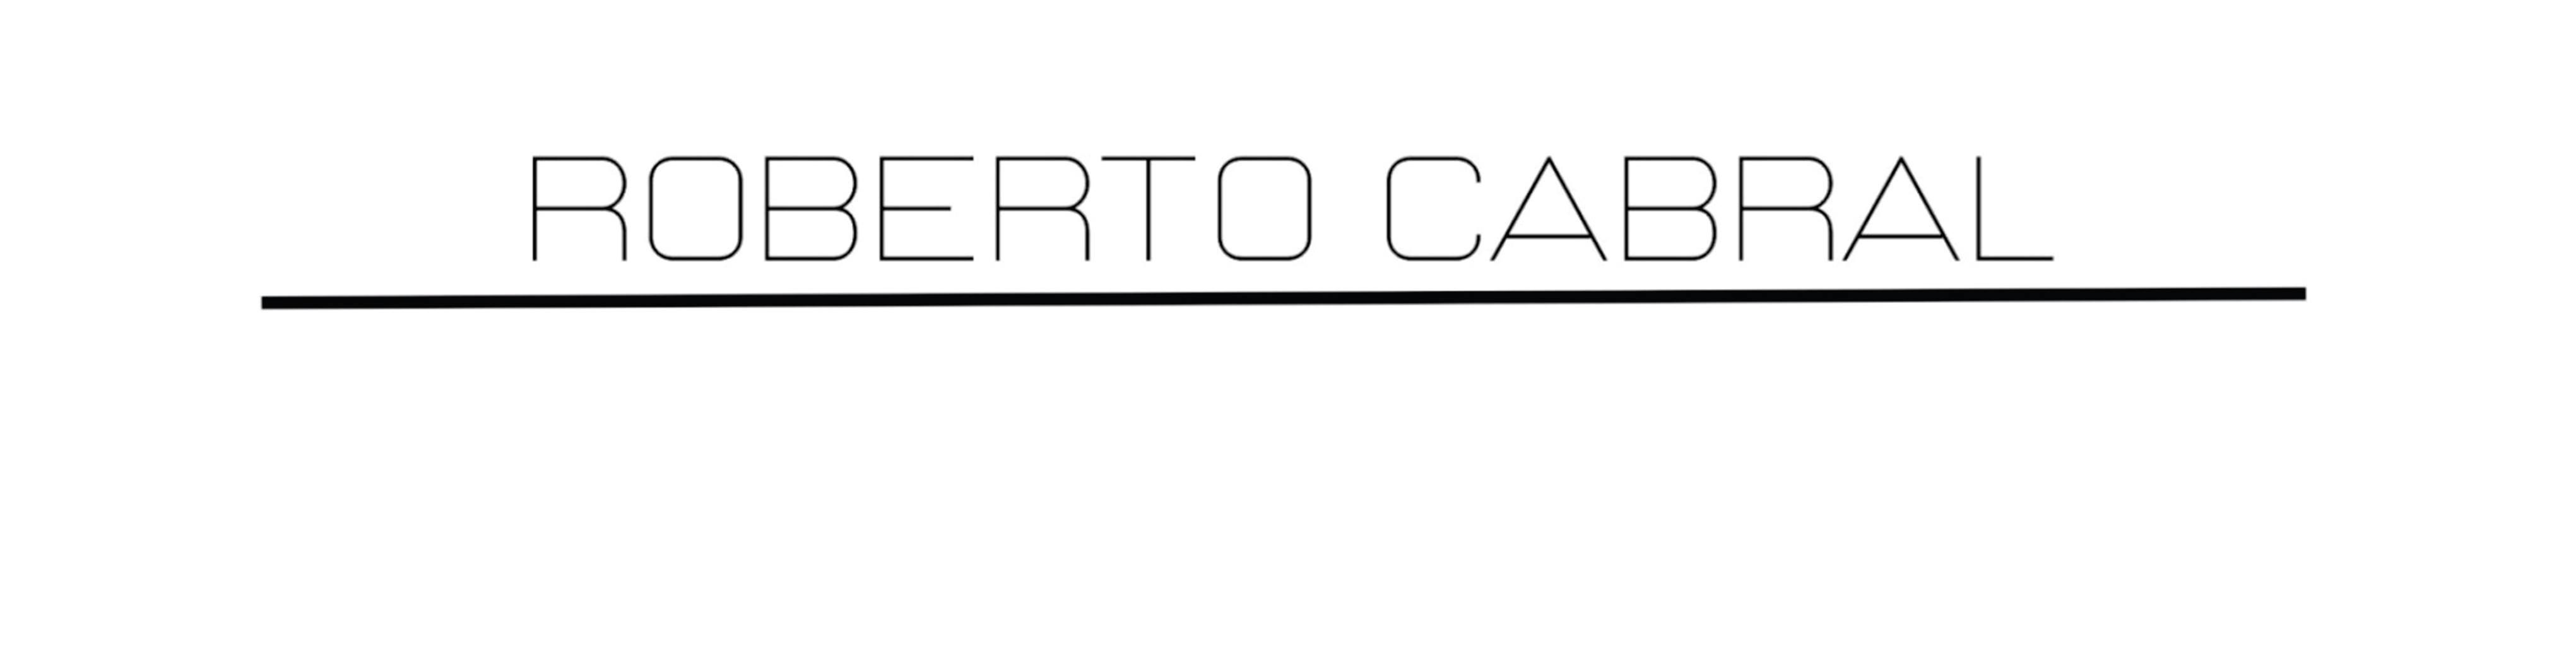 ROBERTO-CABRAL-BLOGS-DE-FOTOGRAFIA-COOBIS-MEXICO